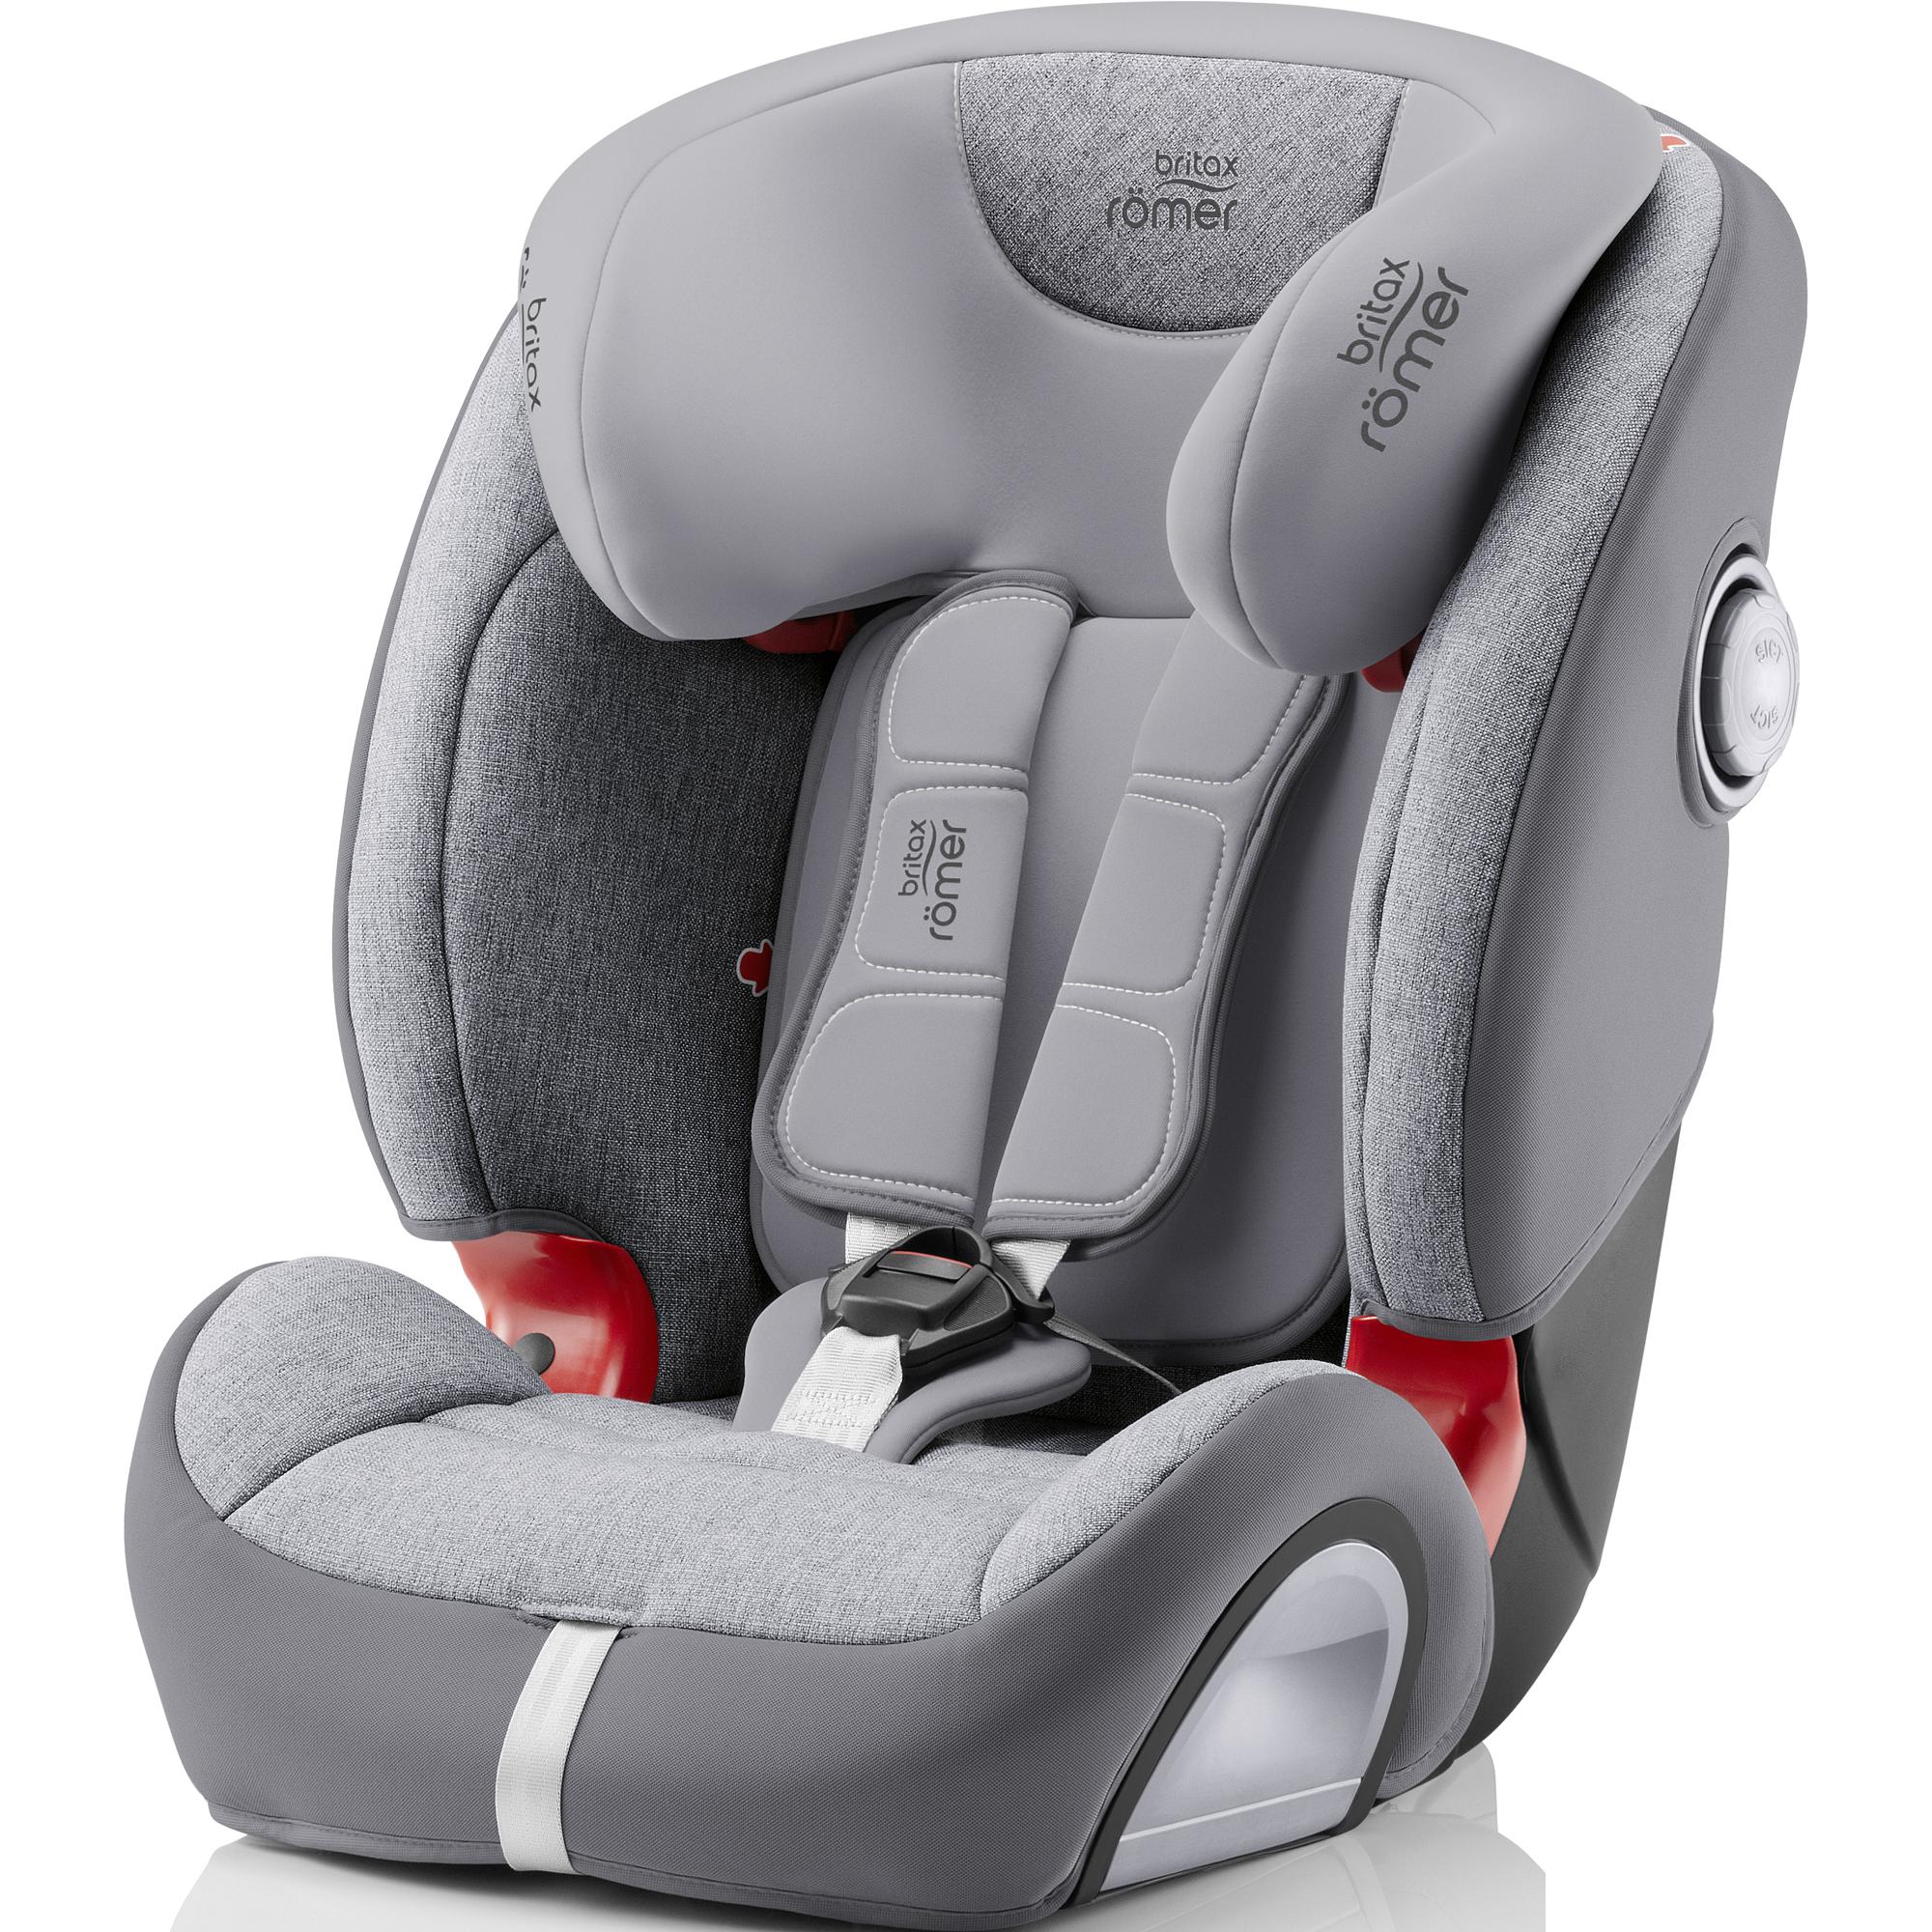 Britax Römer Evolva 123 SL Sict Wine Rose 2018 Kindersitz Autositz